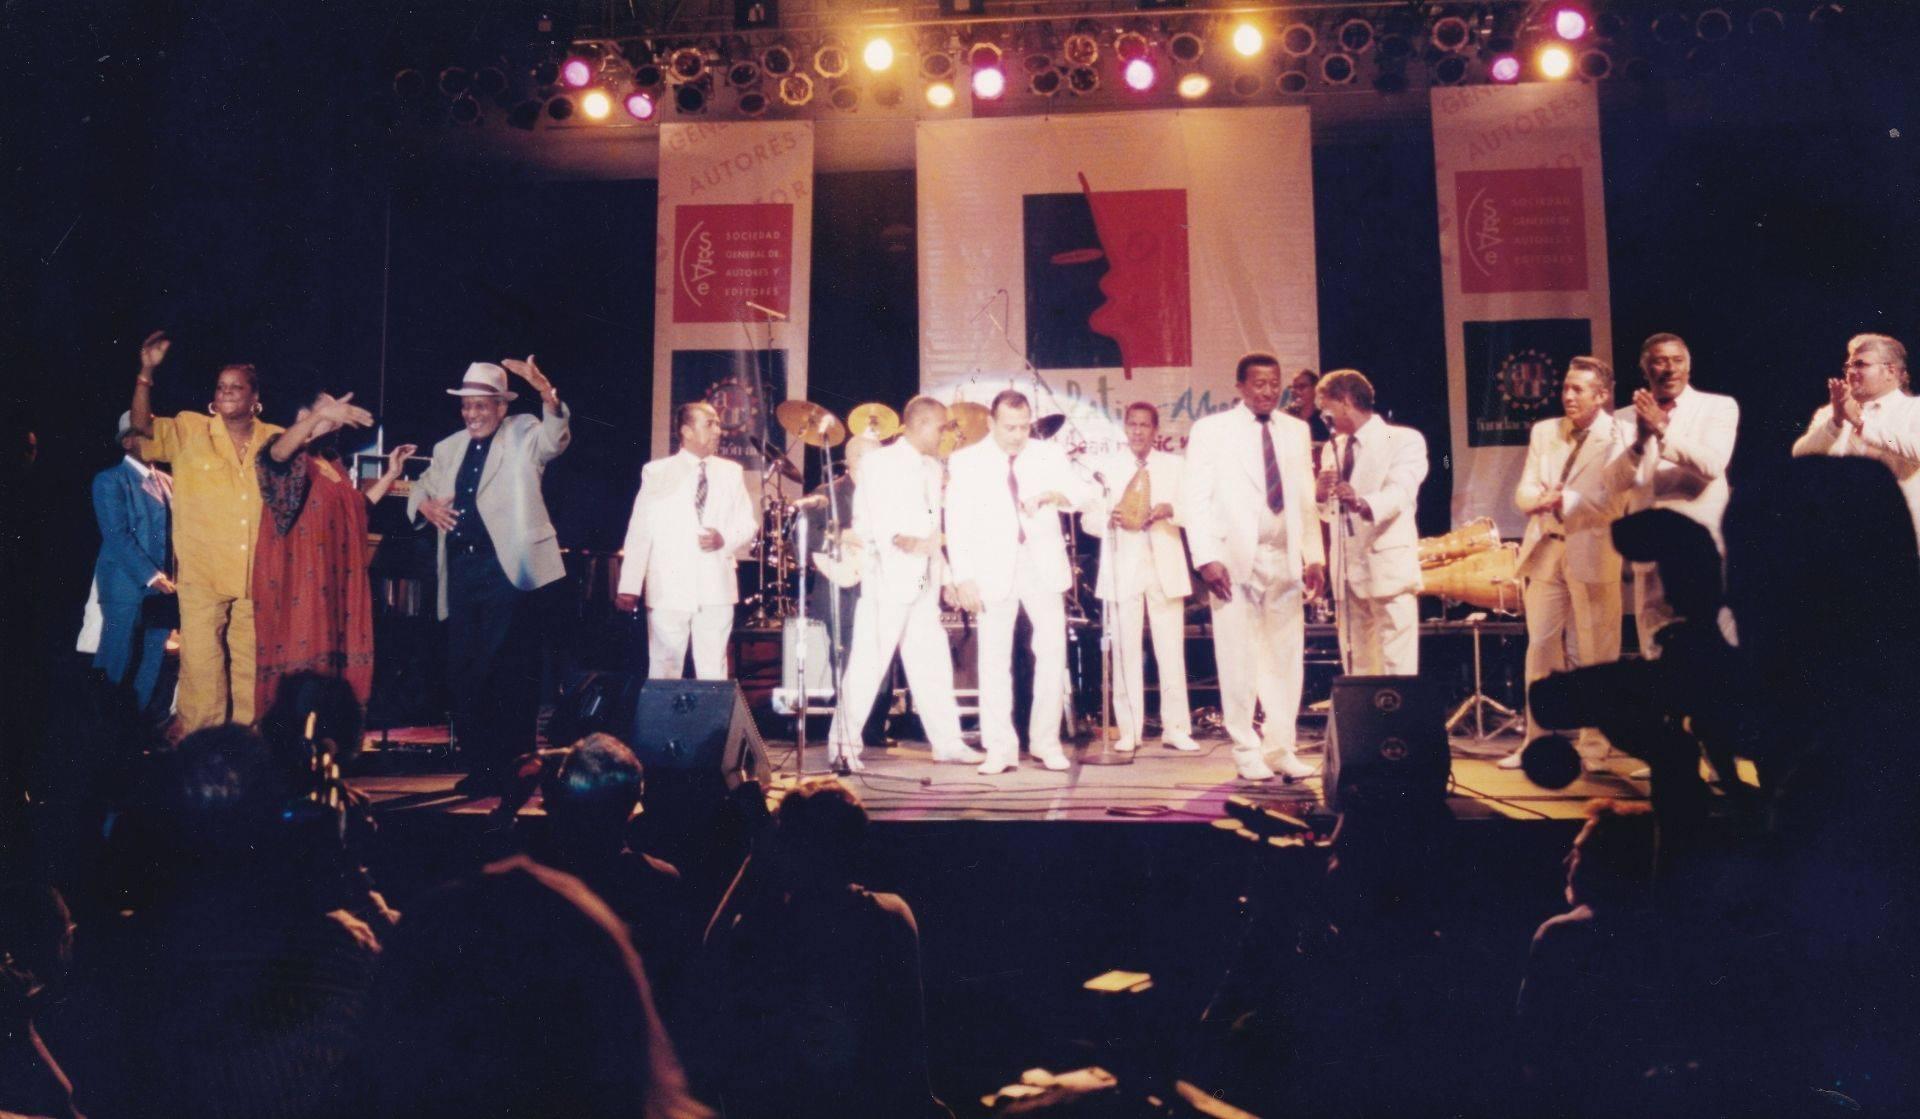 Omara Portuondo, Compay Segundo and other Cuban musicians in the Midem Latino market. Photo: Paco Manzano.